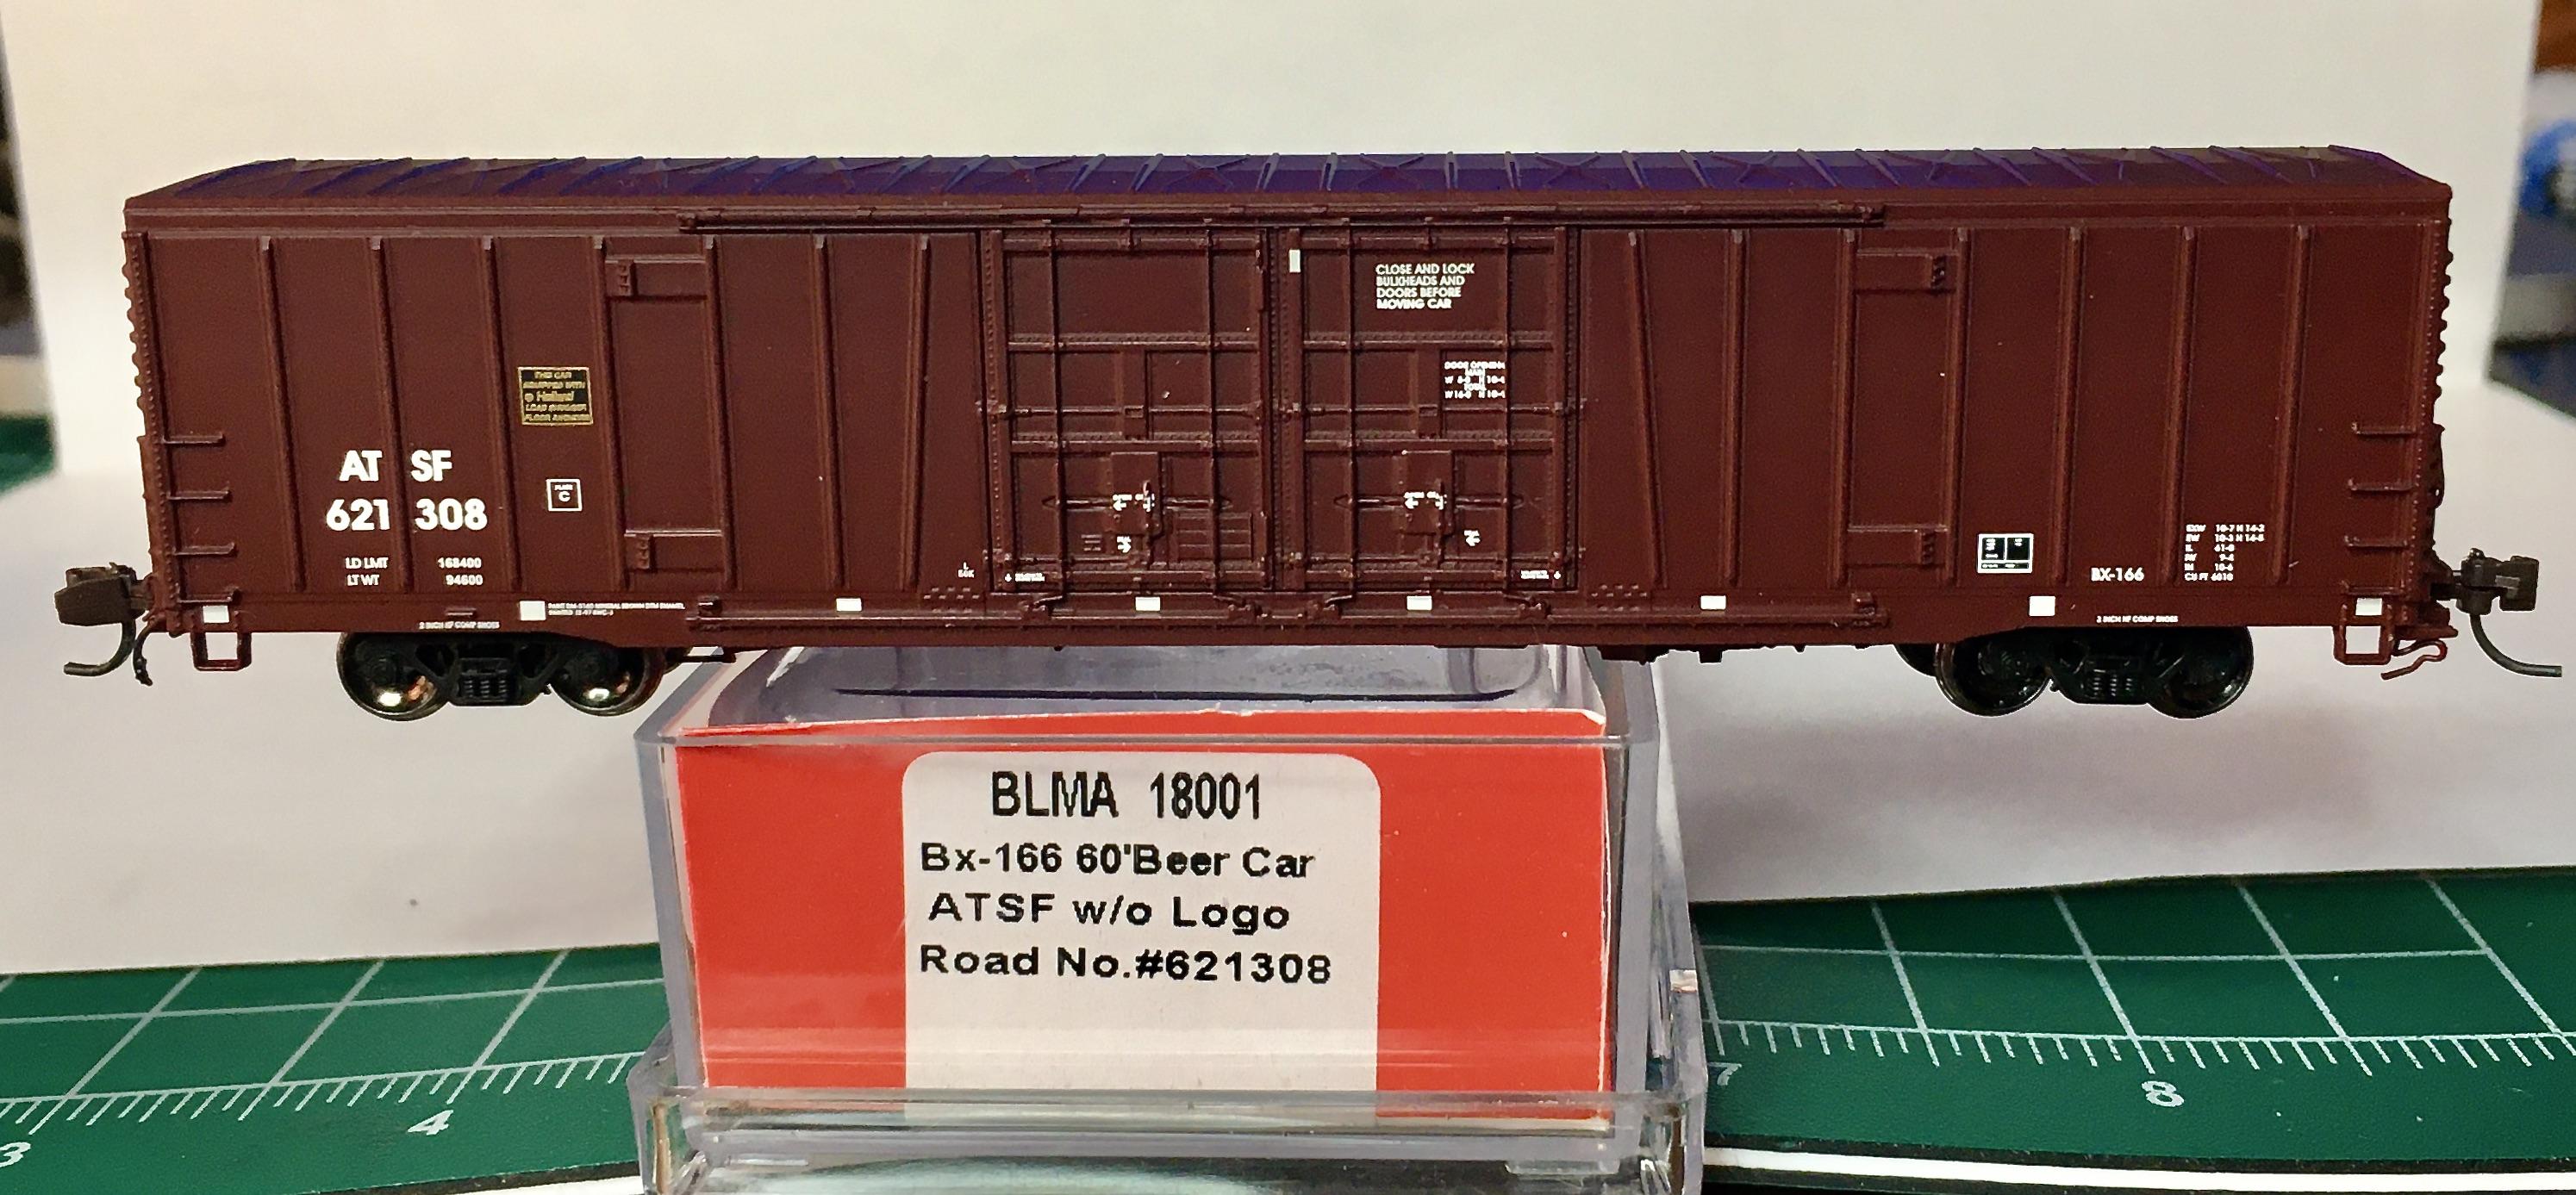 N Scale - BLMA - 18013 - Boxcar, 62 Foot, BX-166 - Santa Fe - 621308